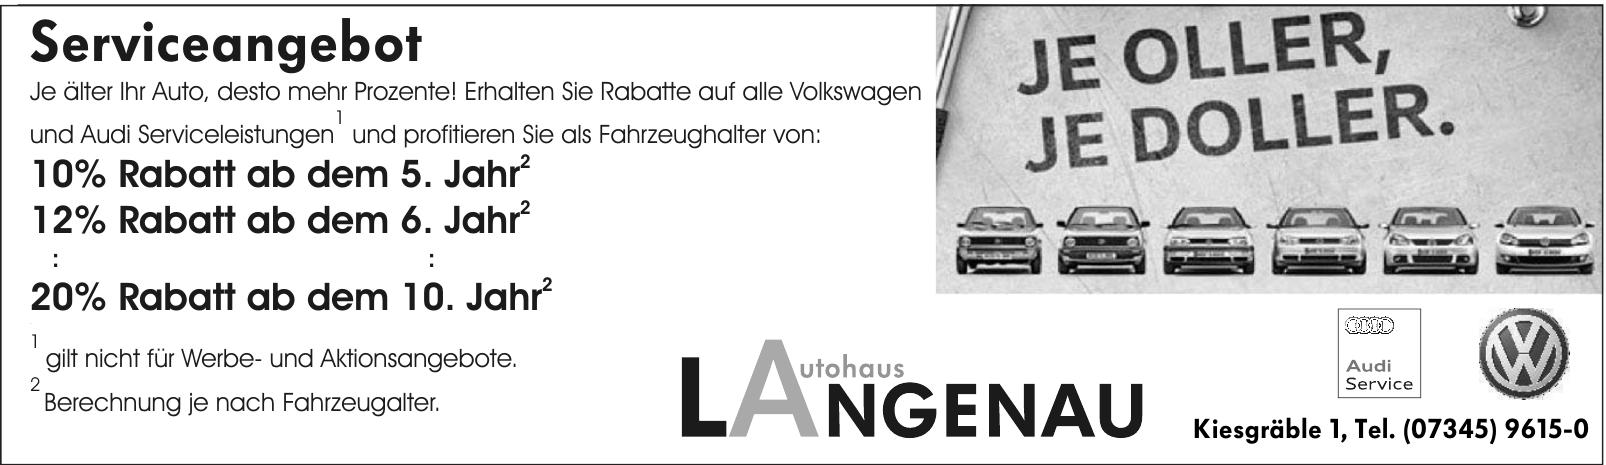 Autohaus Langenau